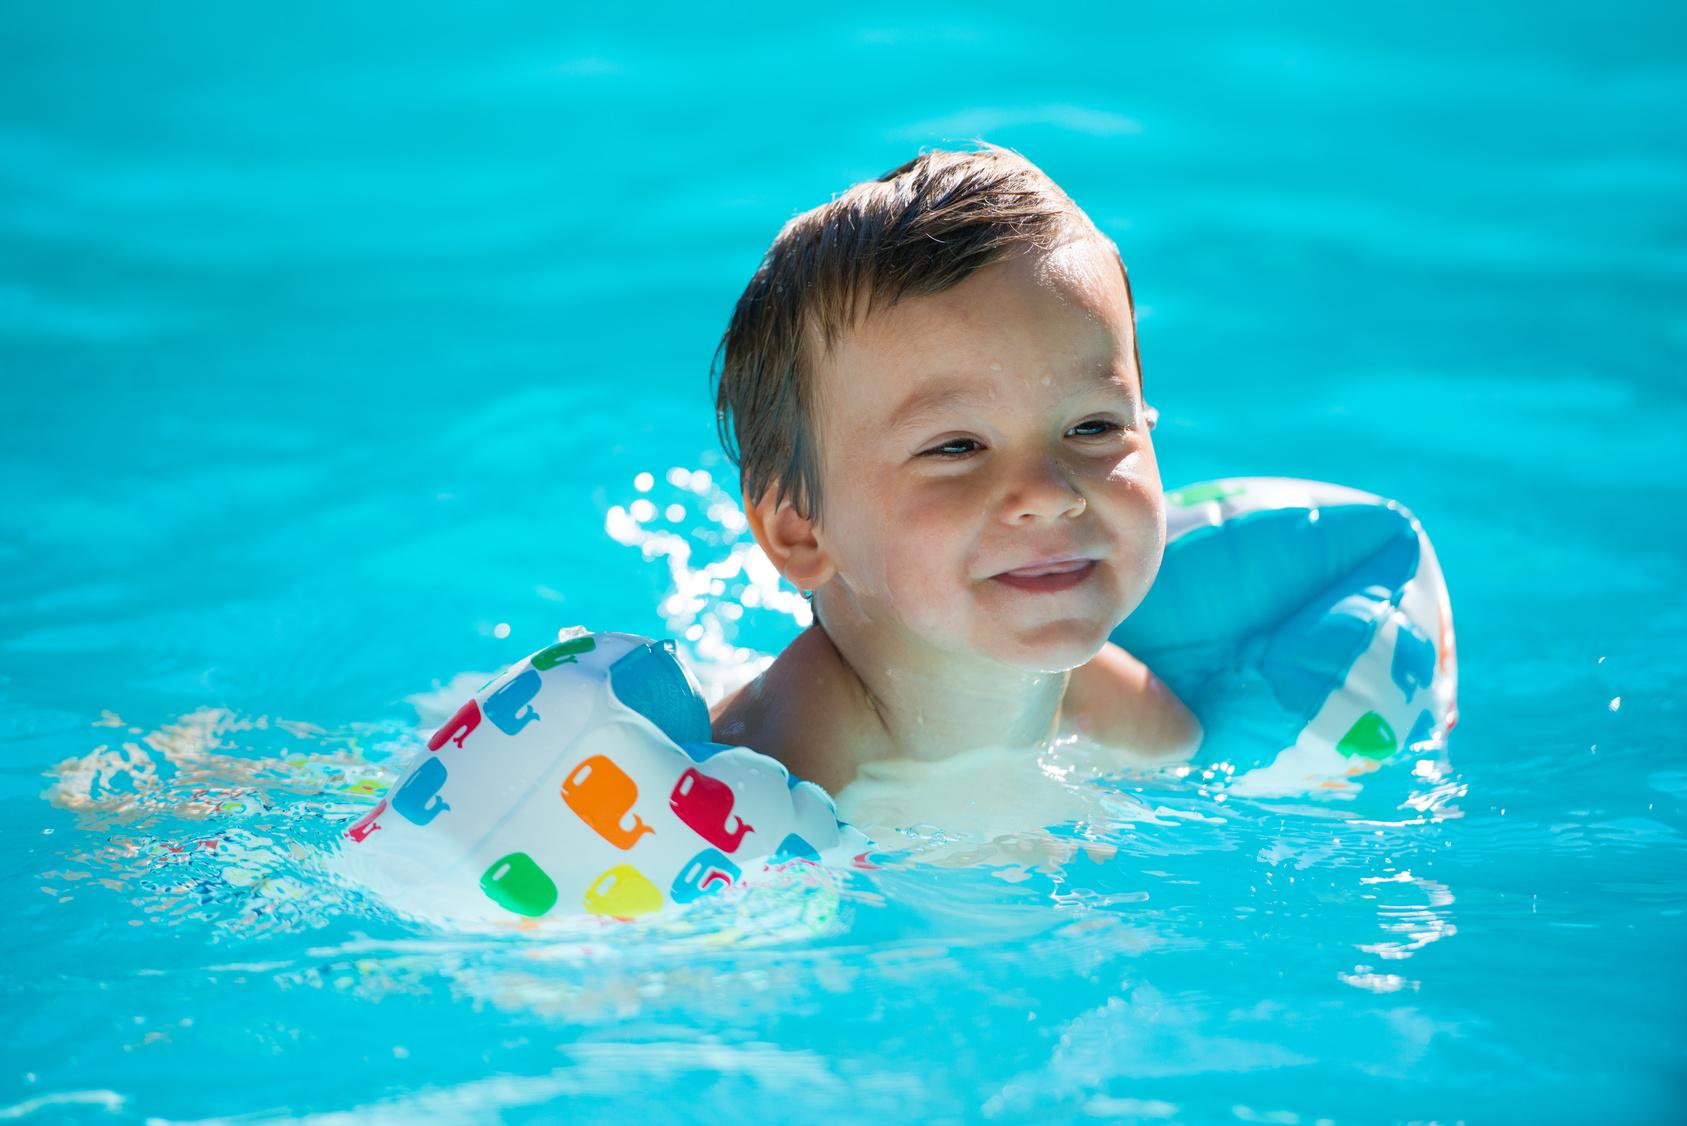 enfant avec des brassards- la piscine